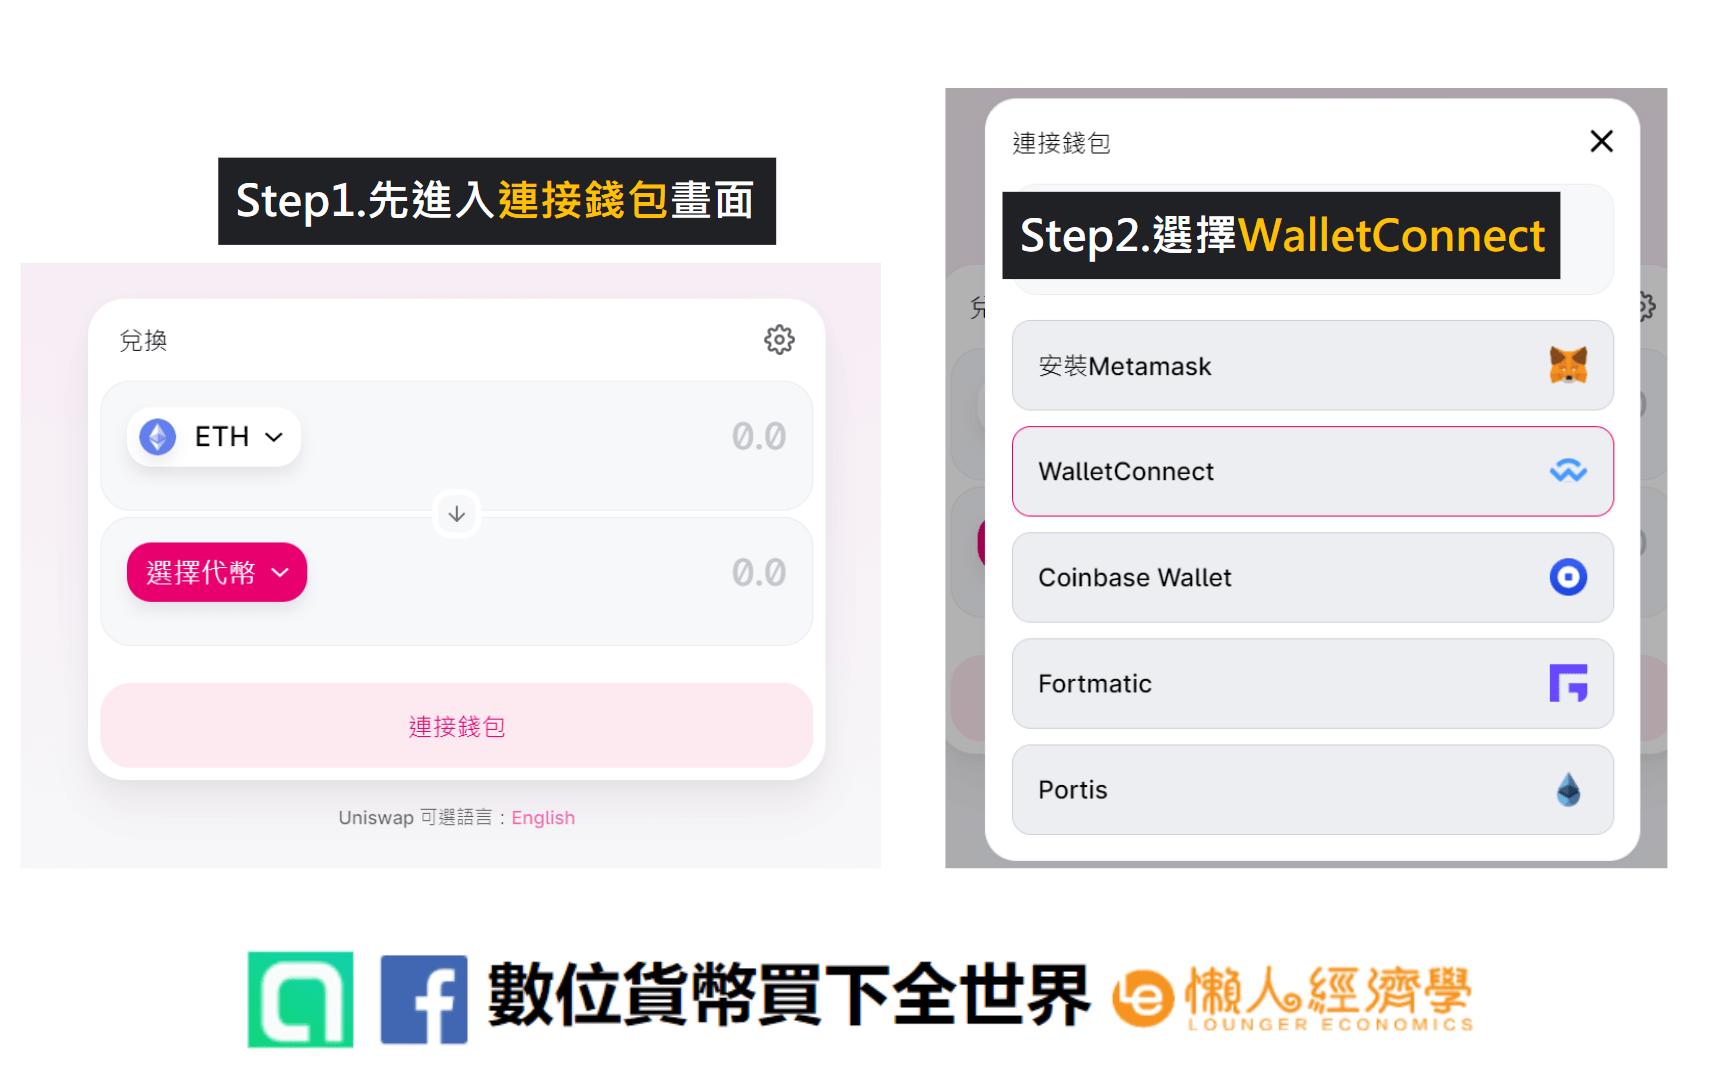 CoolWallet Pro的WalletConnect教學:先打開交易所連接錢包地址畫面,再選擇WalletConnect